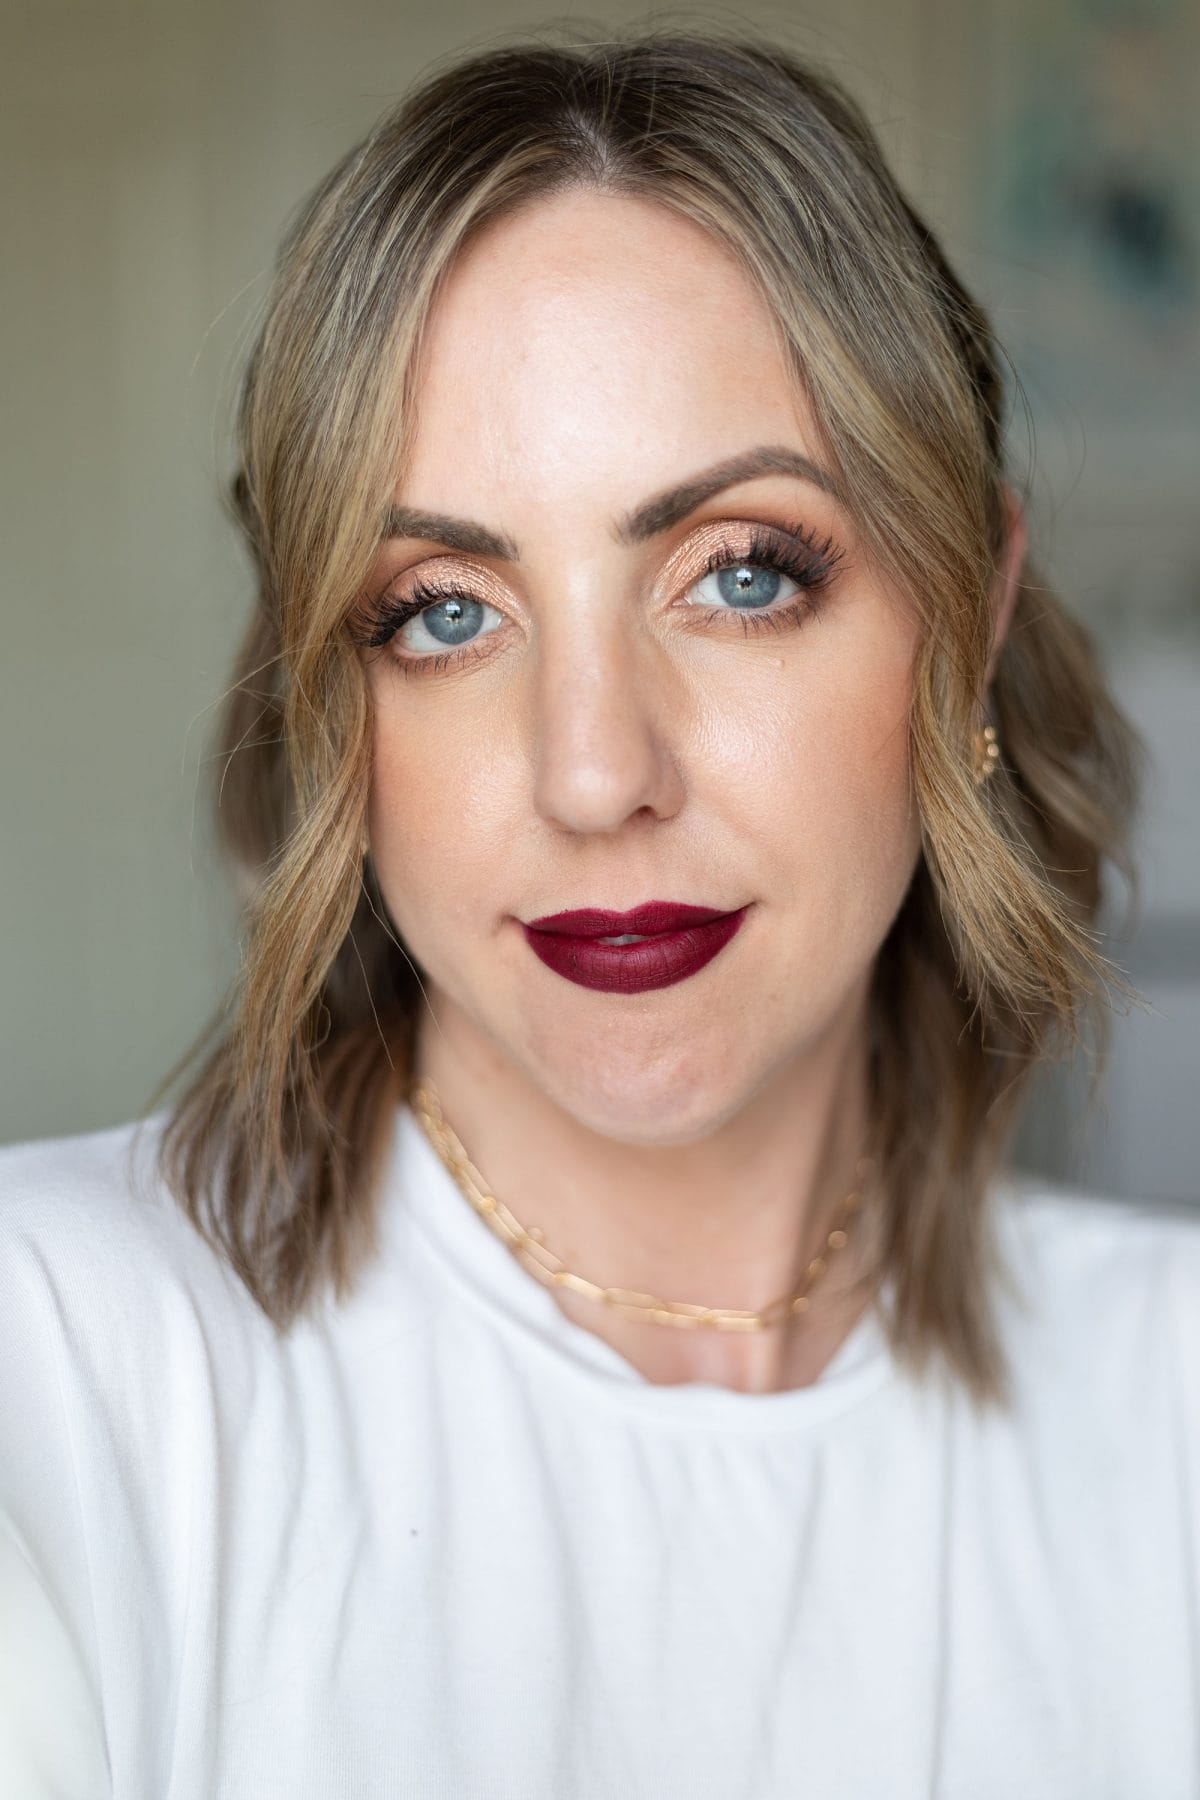 Maybelline Ultimatte Slim Lipstick in More Berry lip swatch